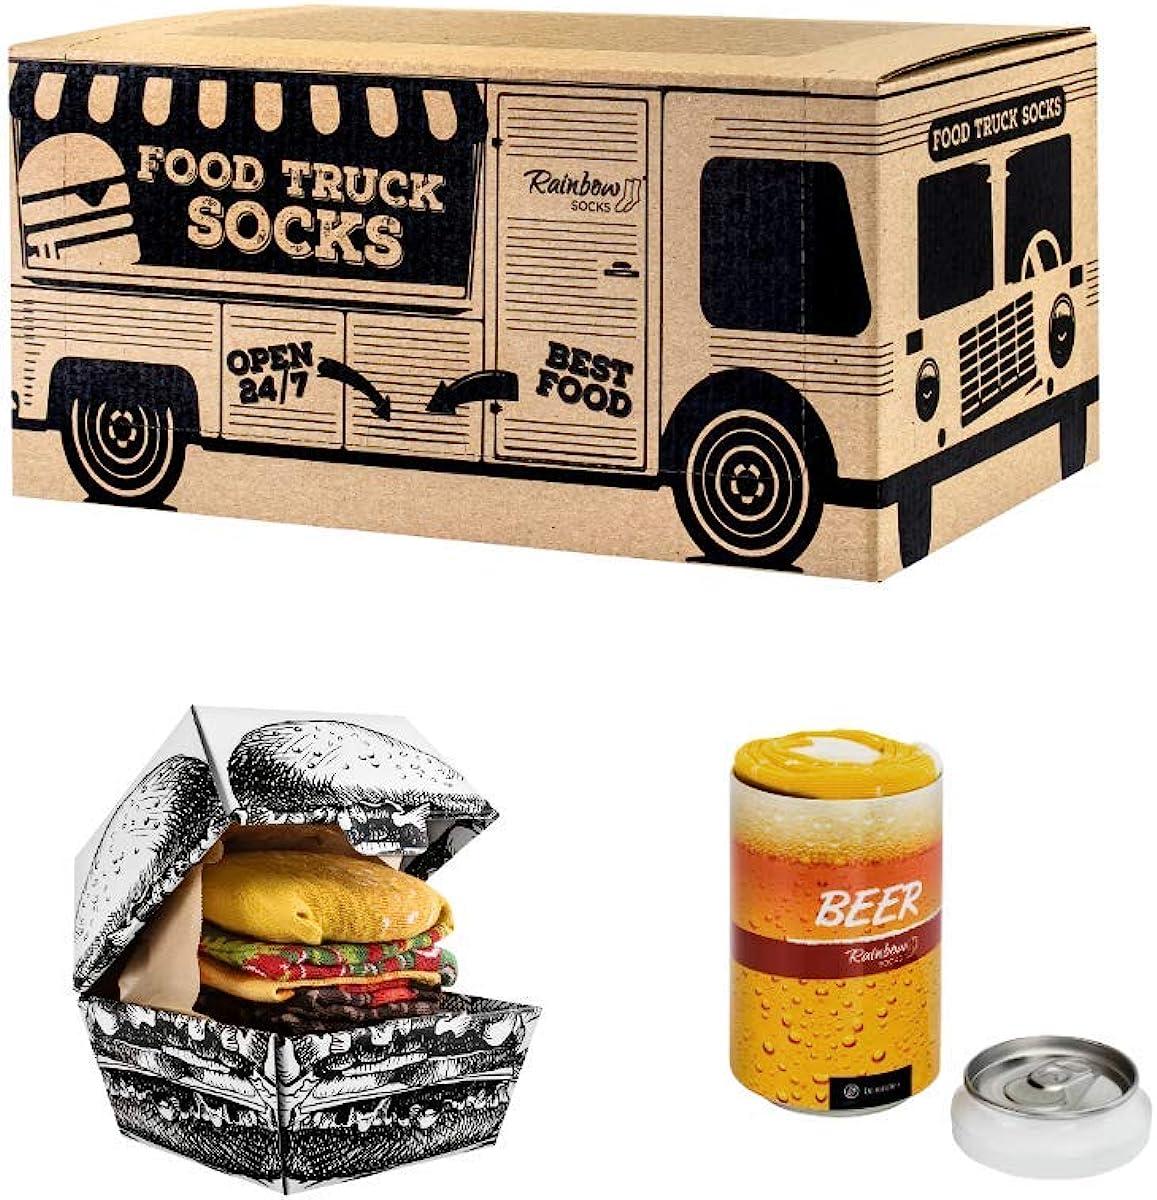 Rainbow Socks - Men Women Funny Food Truck Box - 3 Pairs